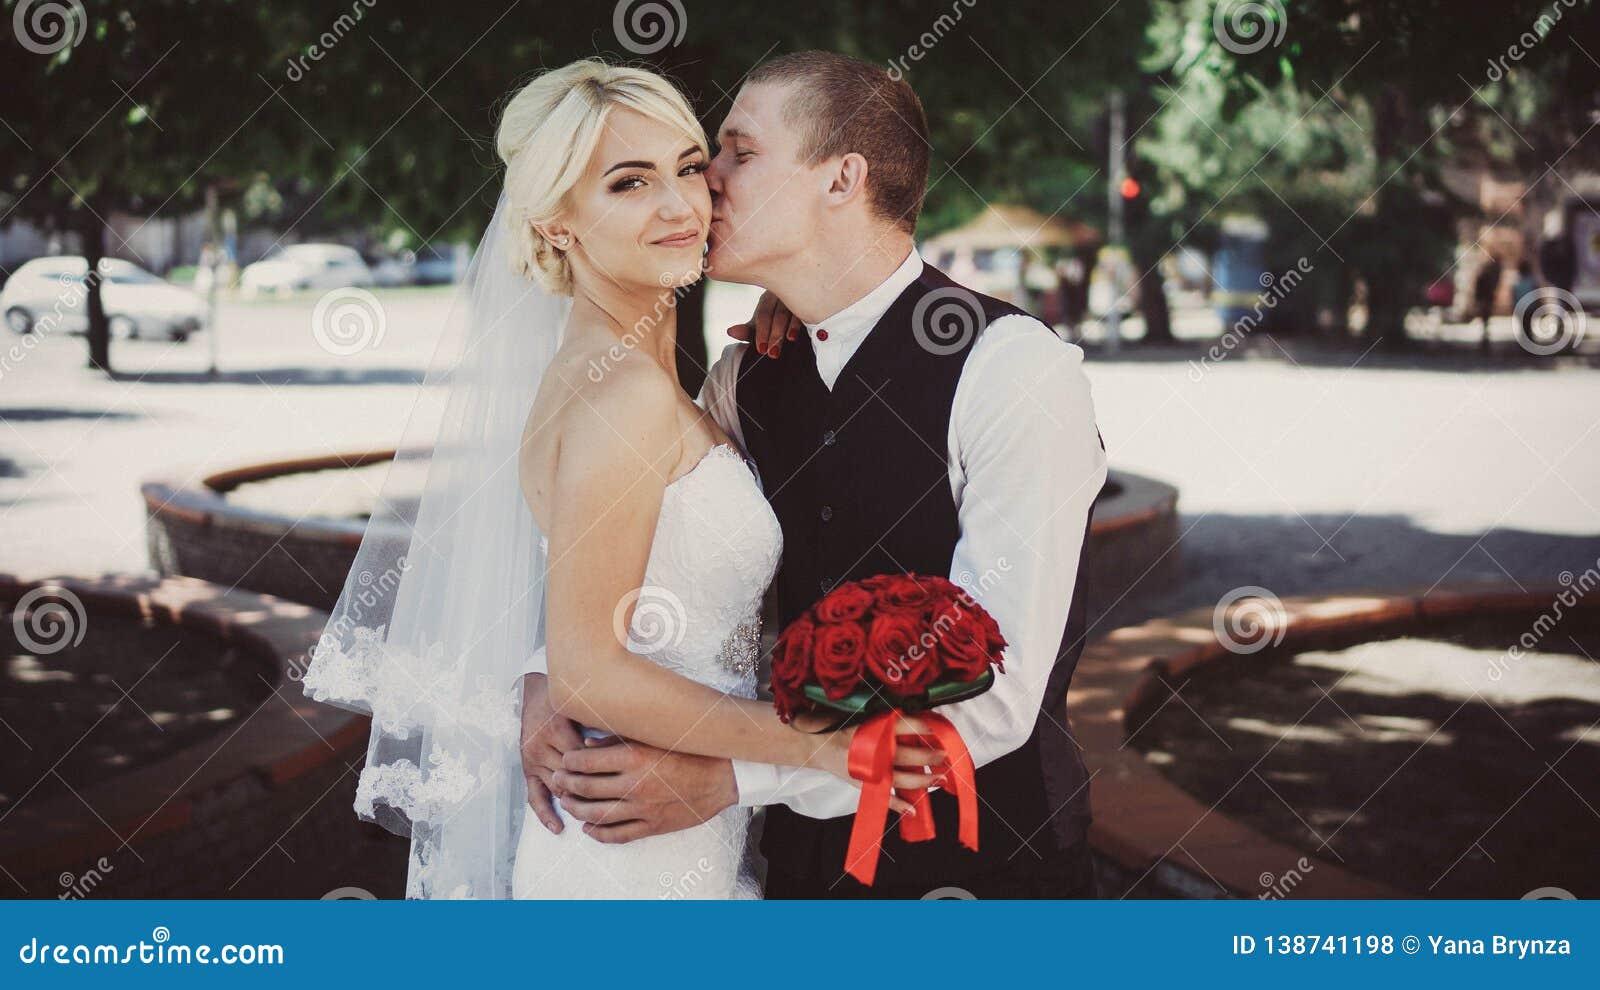 Fornal obejmuje panny młodej na policzku i całuje